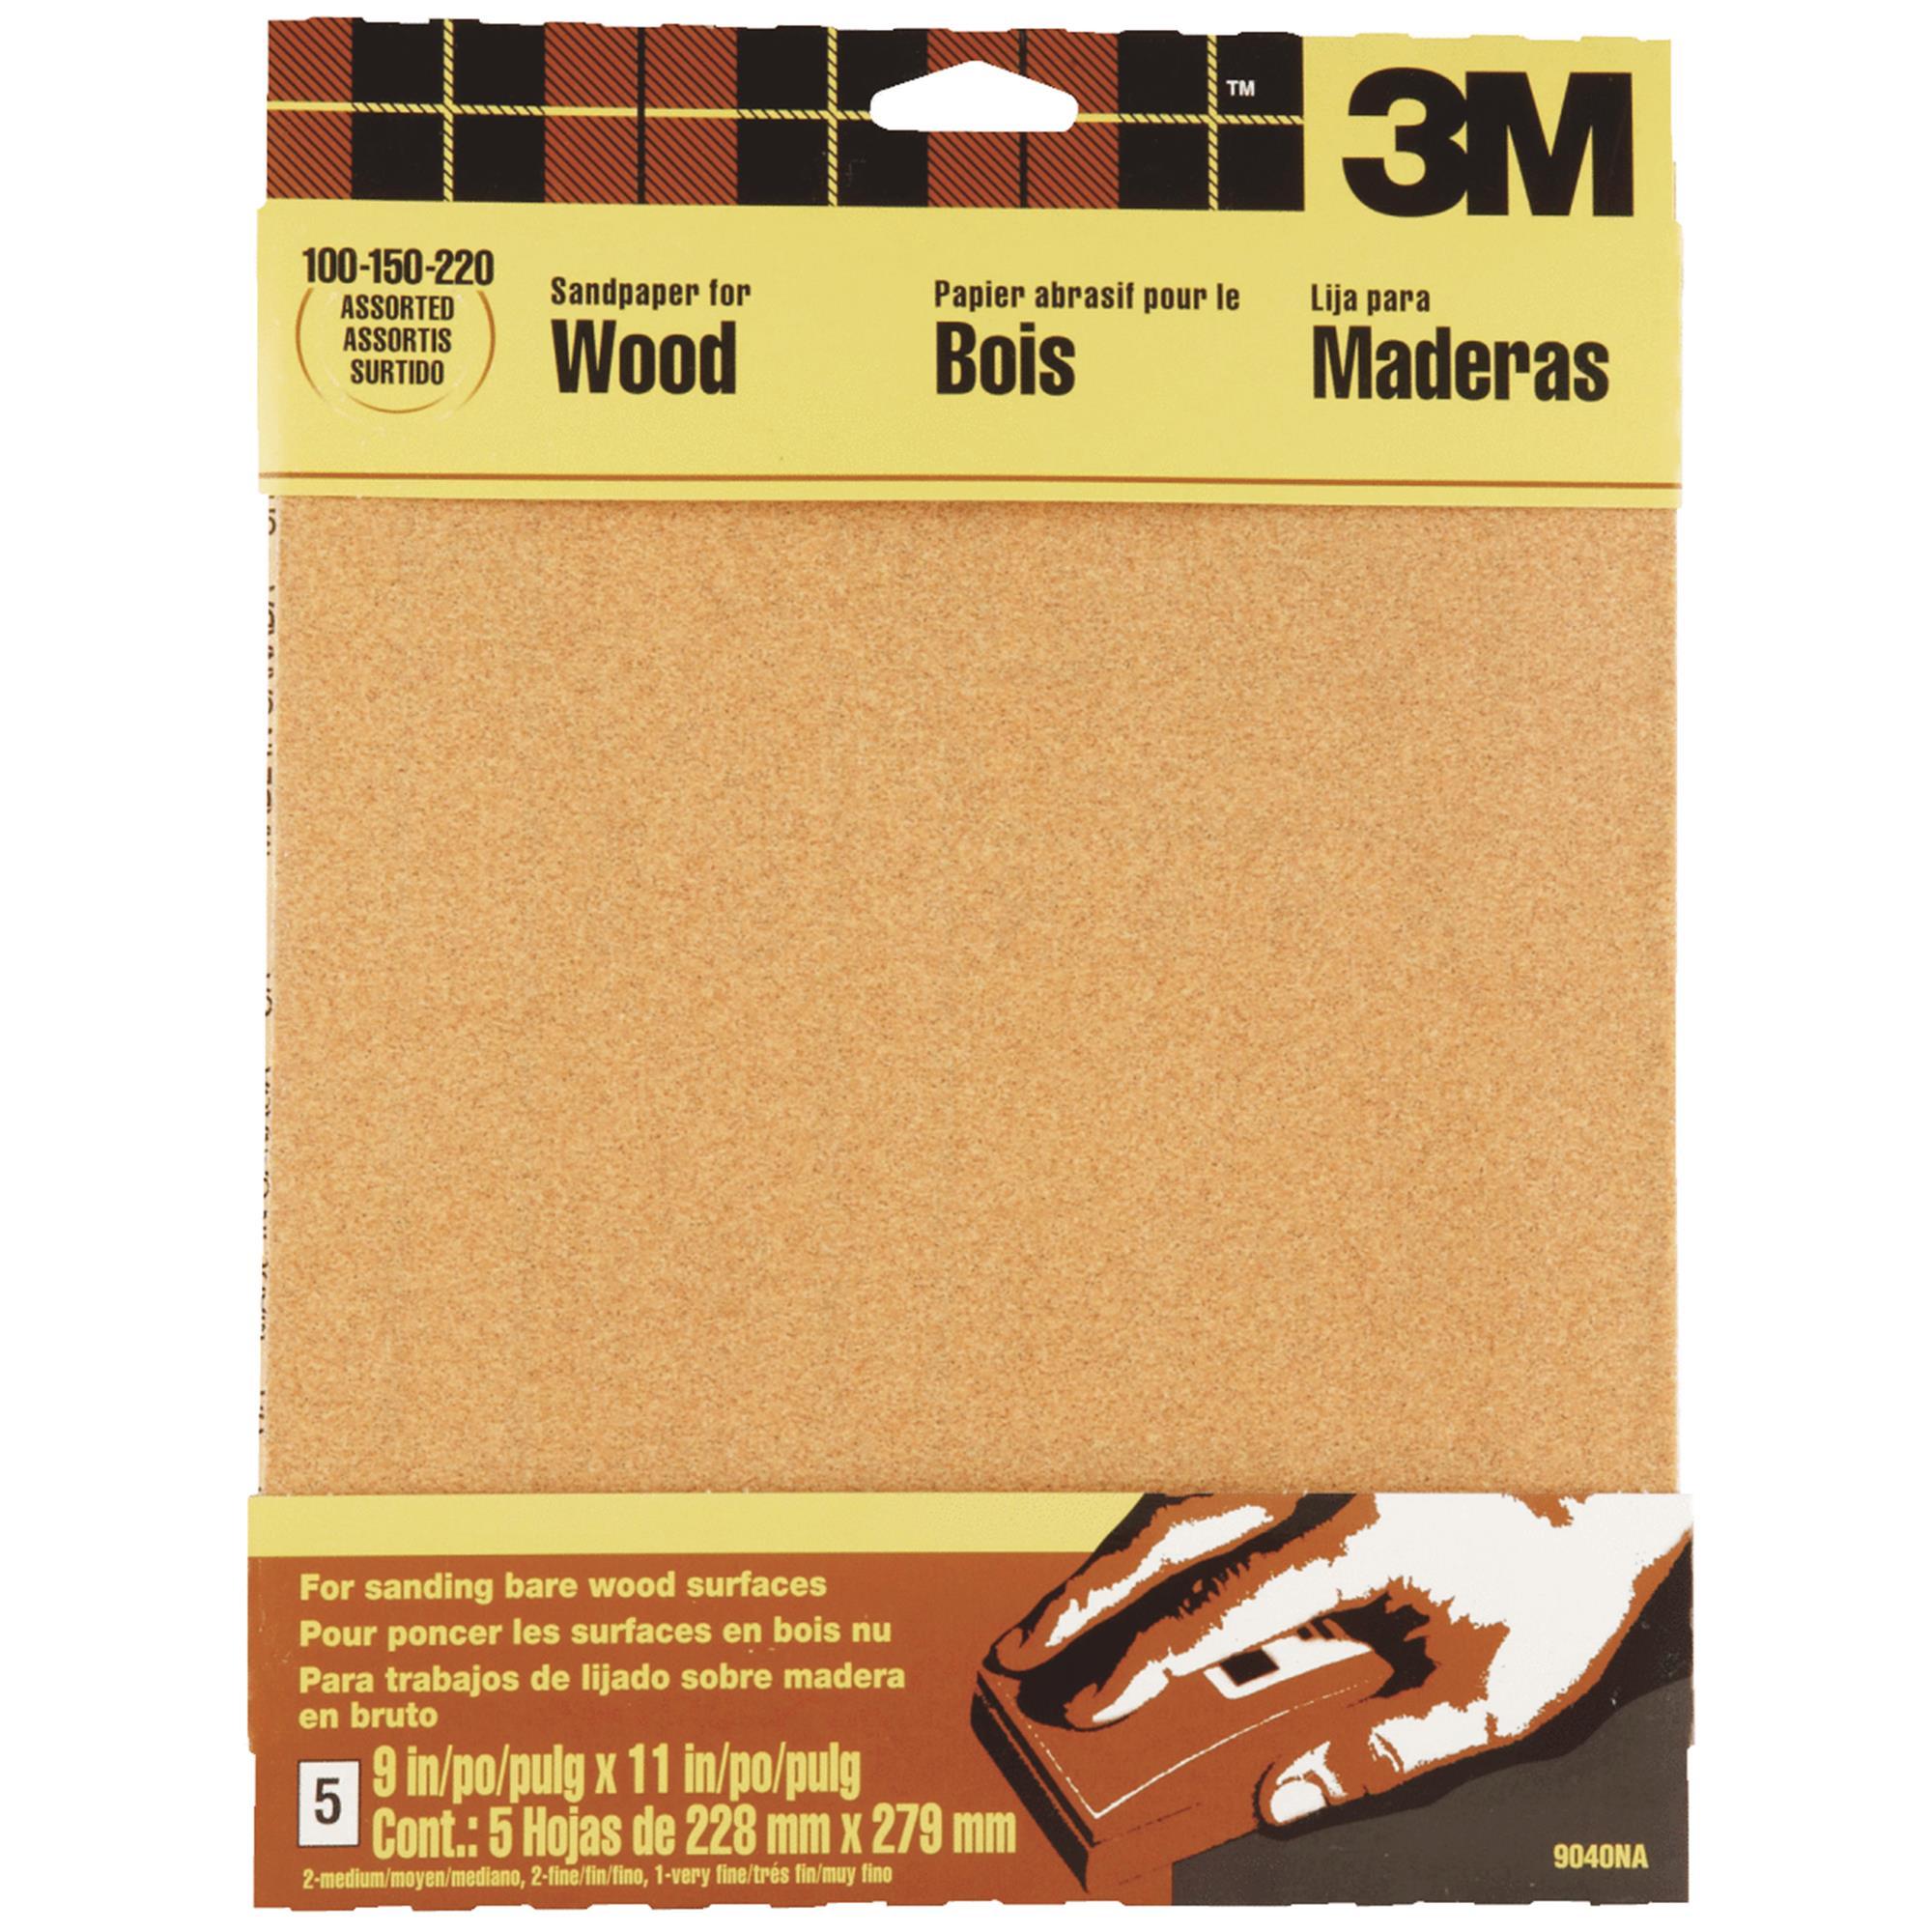 3M Wood Sandpaper